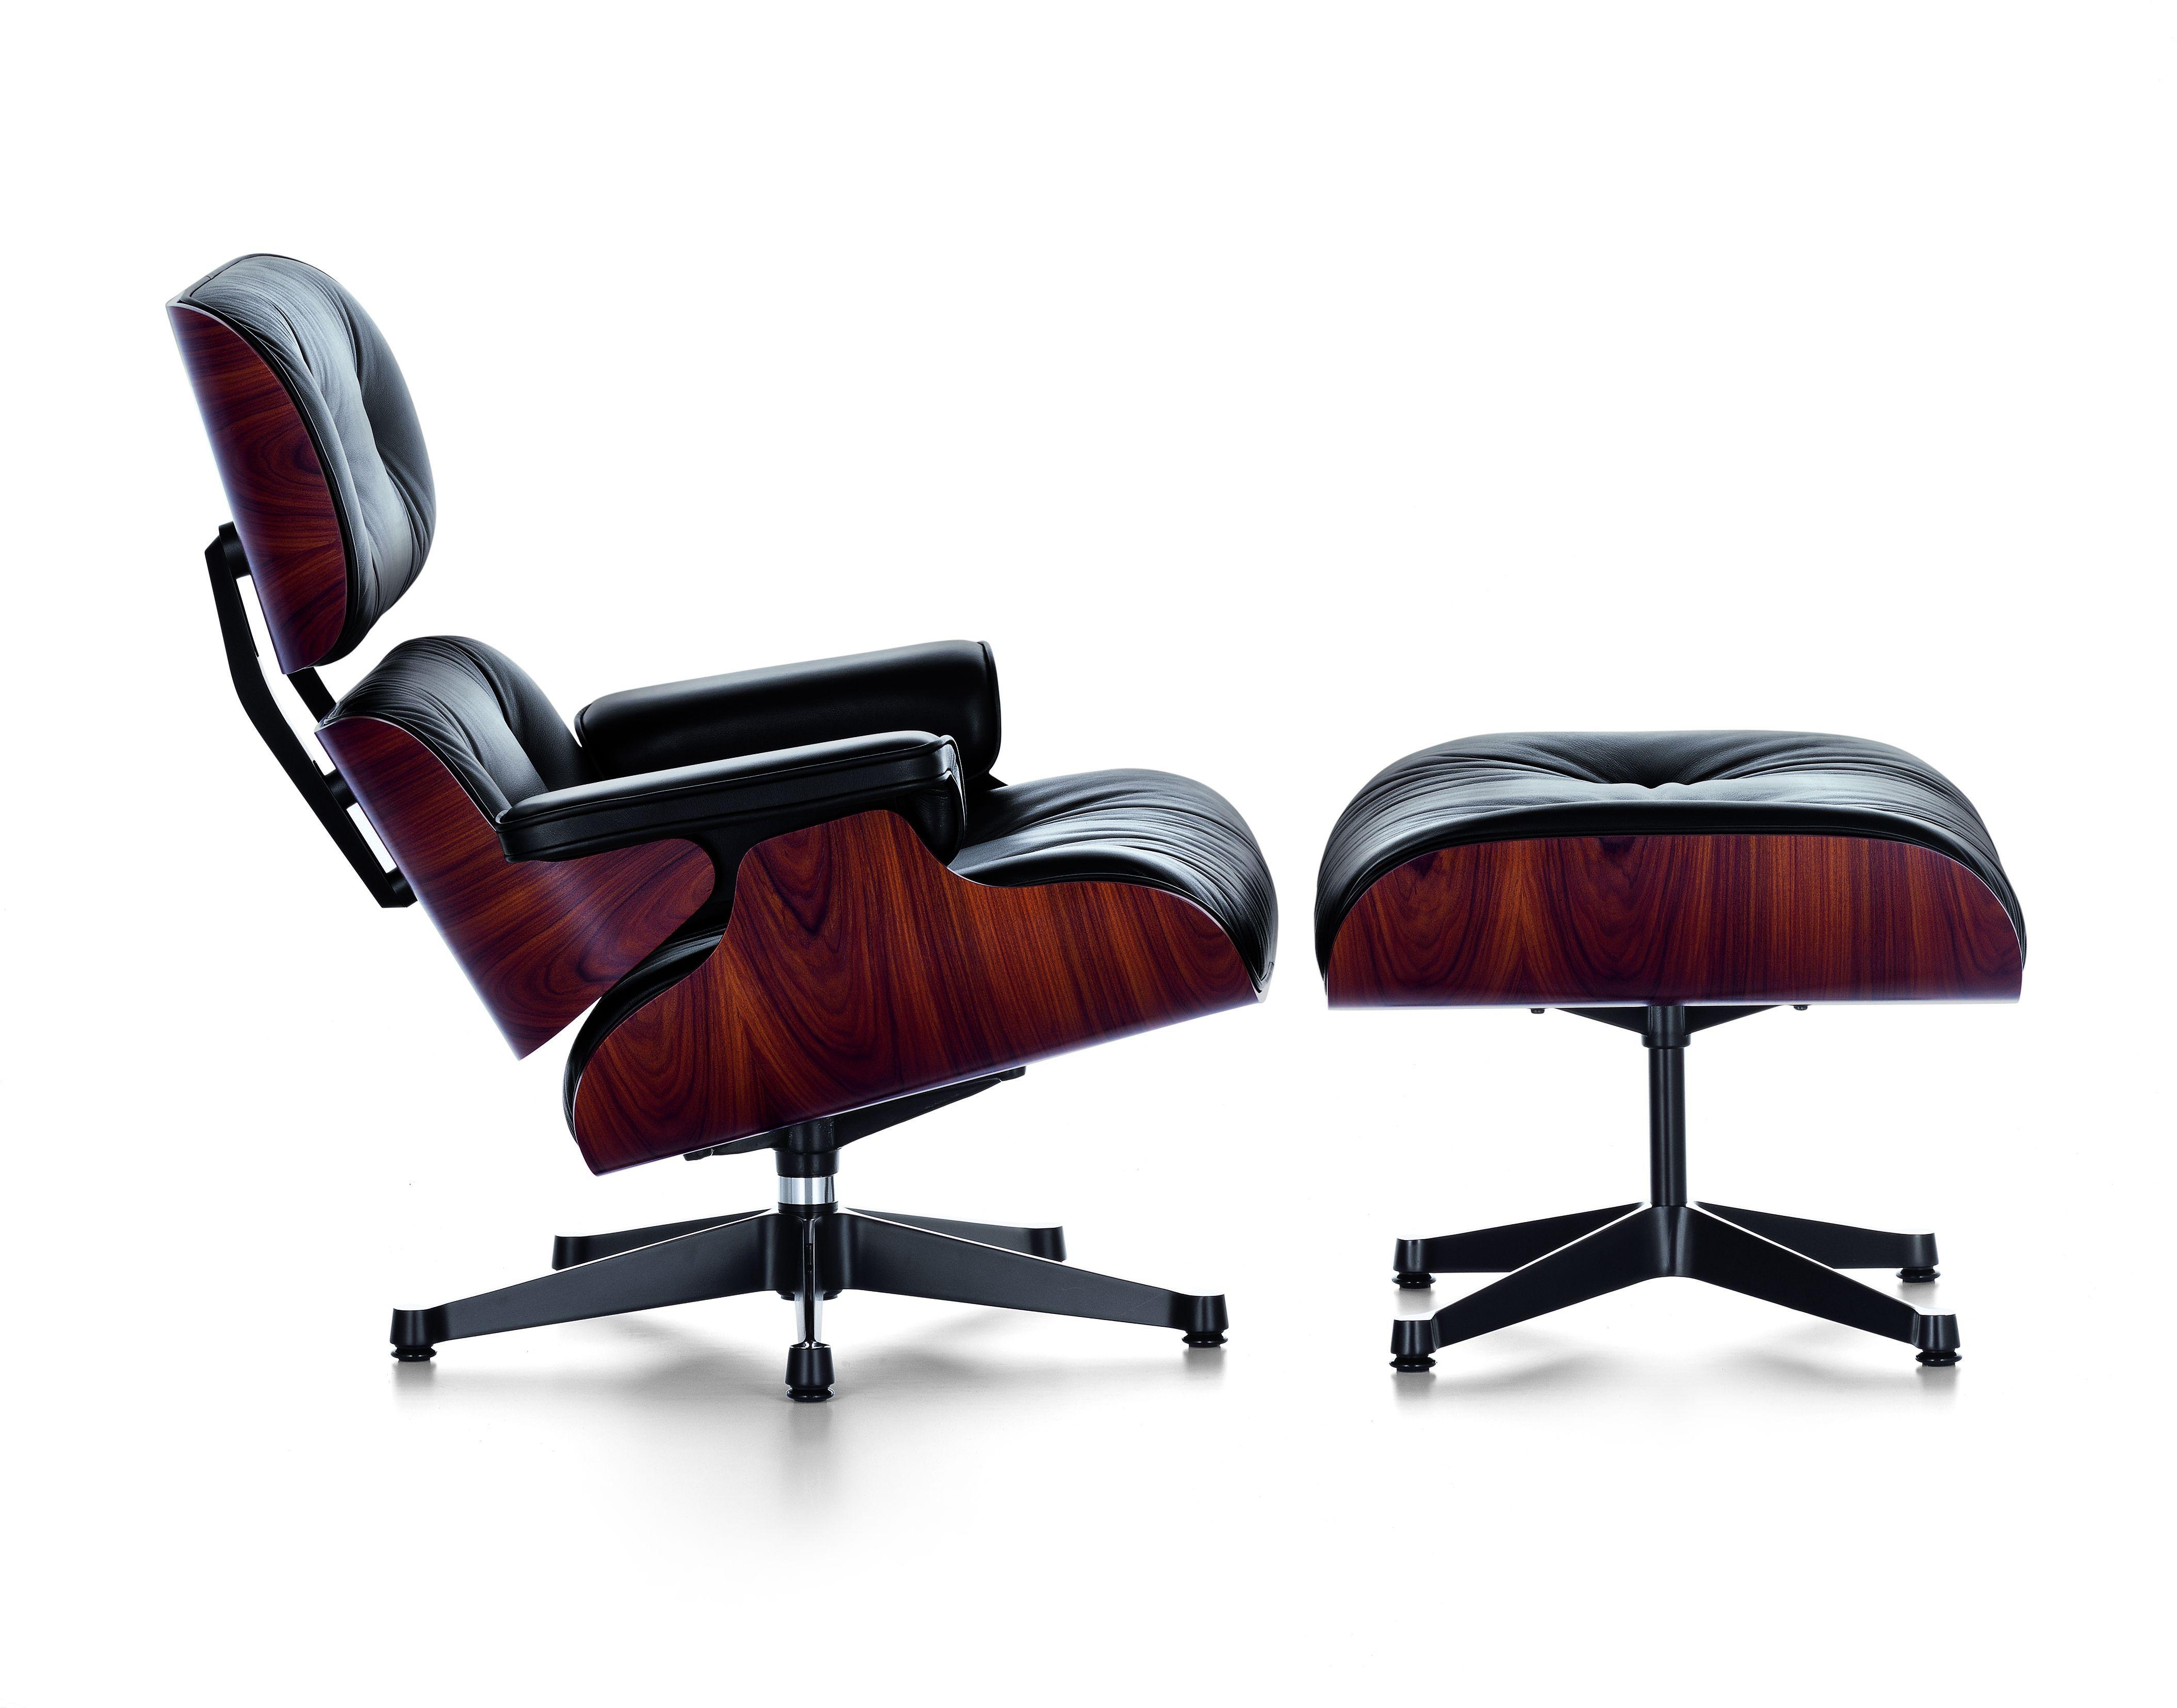 Lounge Chair & Ottoman Designklassiker, Sessel design